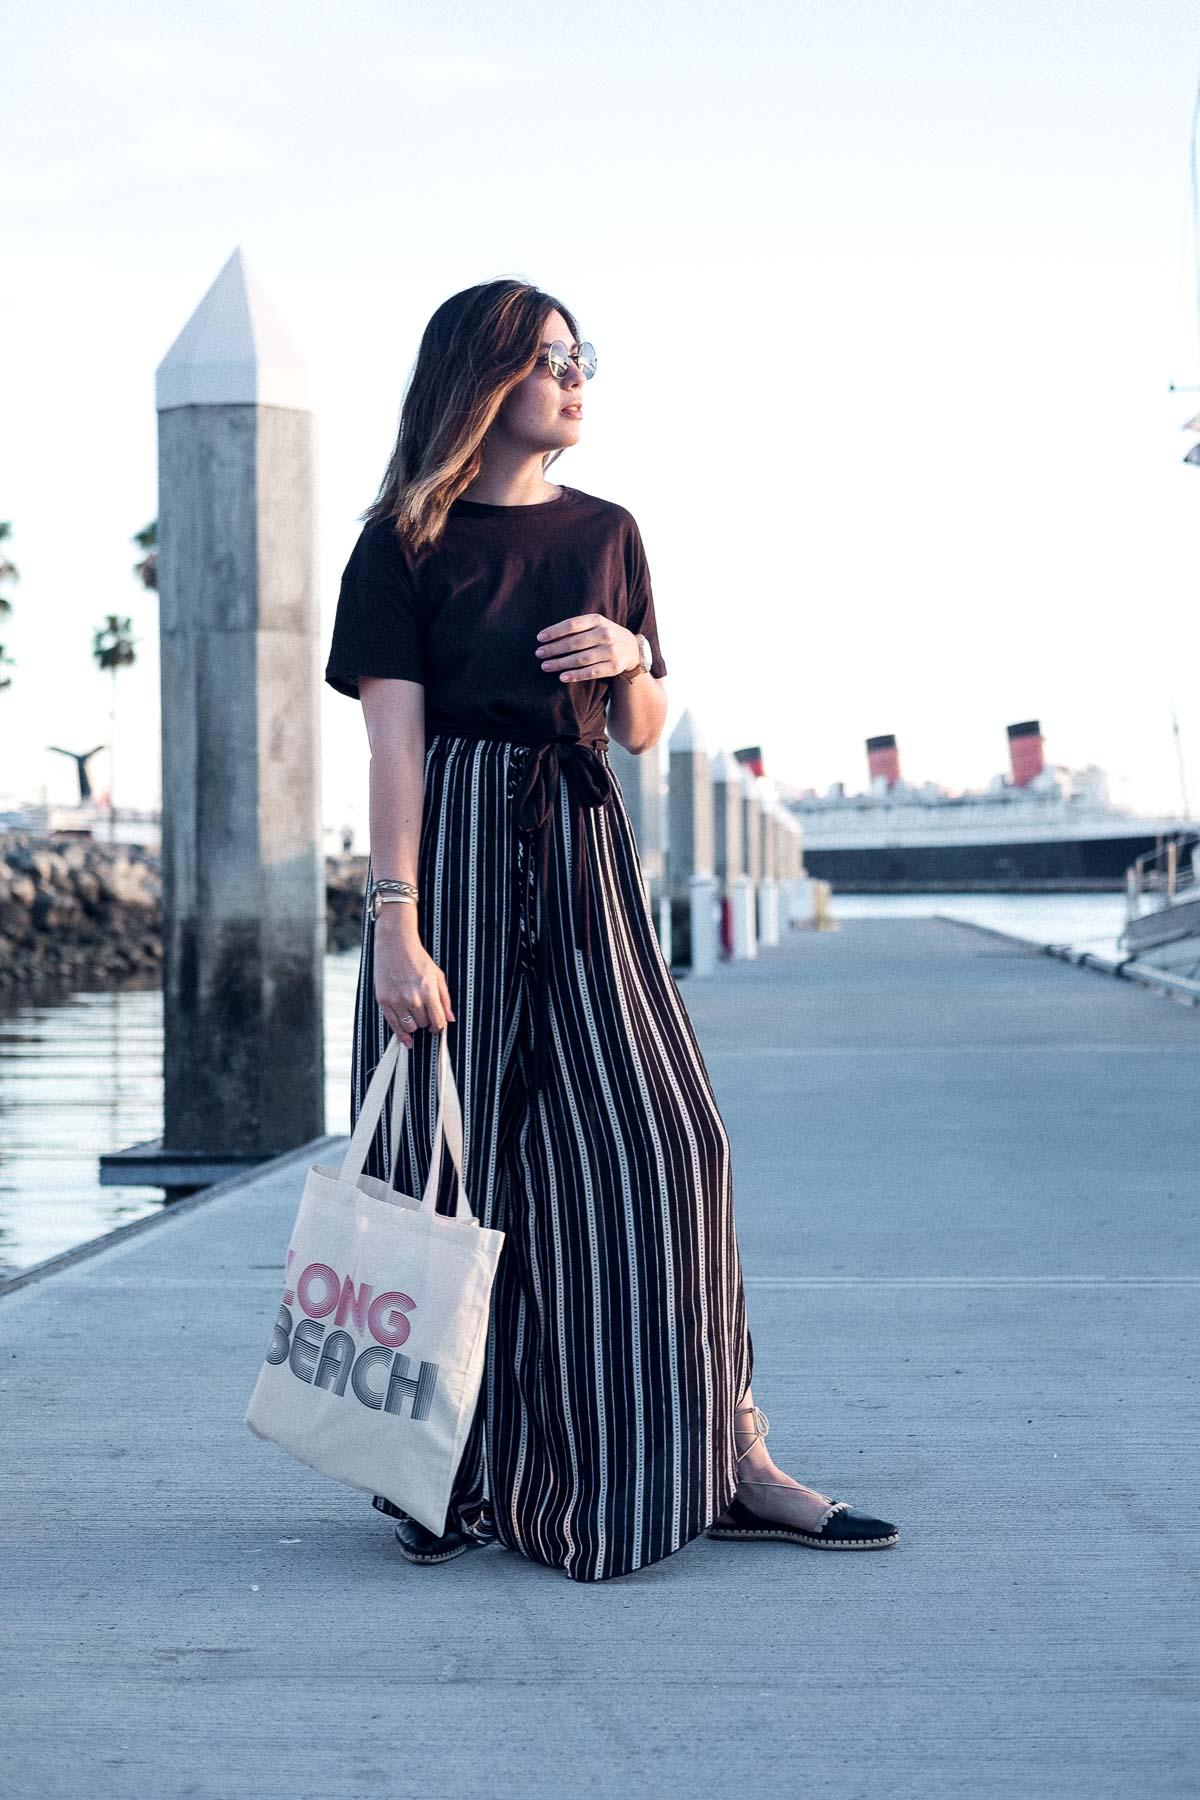 Rachel Off Duty: Wide-Legged Pants and Long Beach Tote Bag